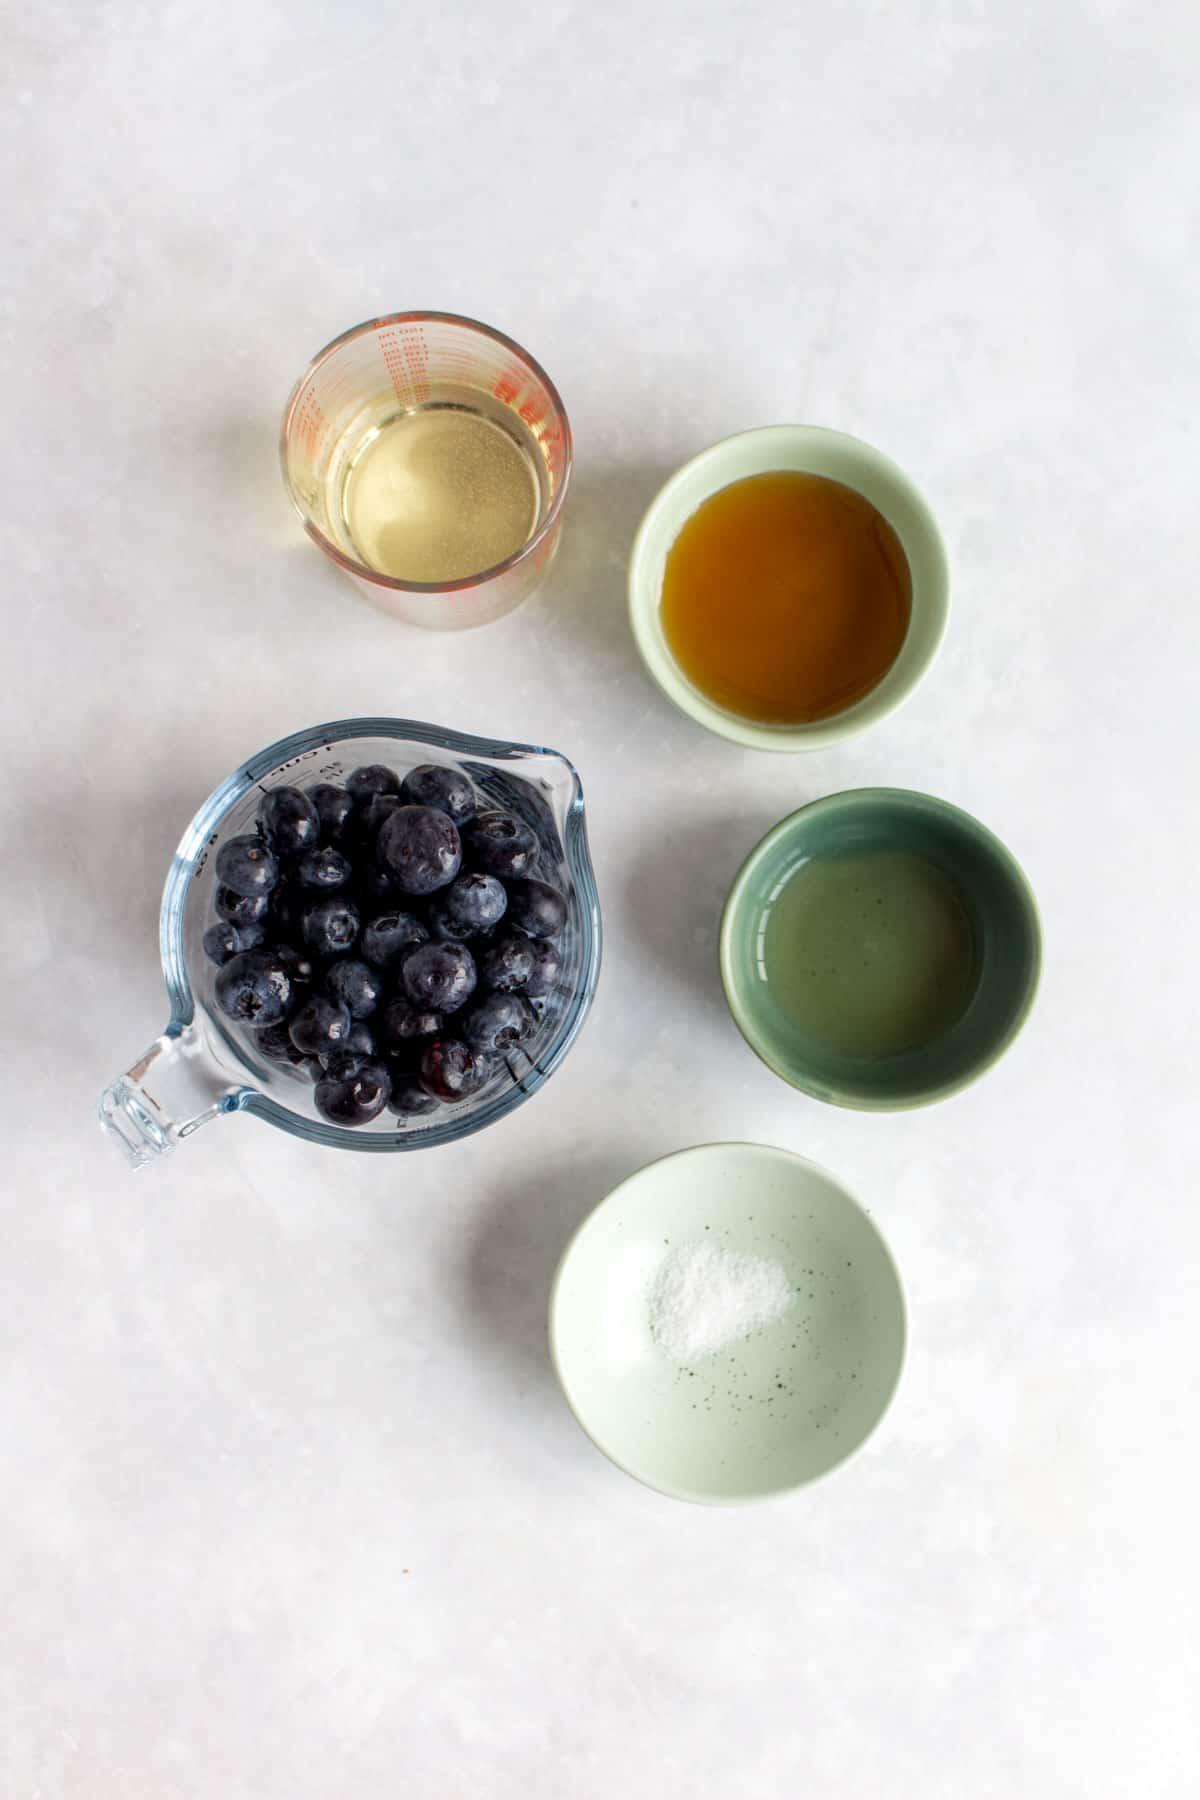 Ingredients needed to make blueberry vinaigrette.